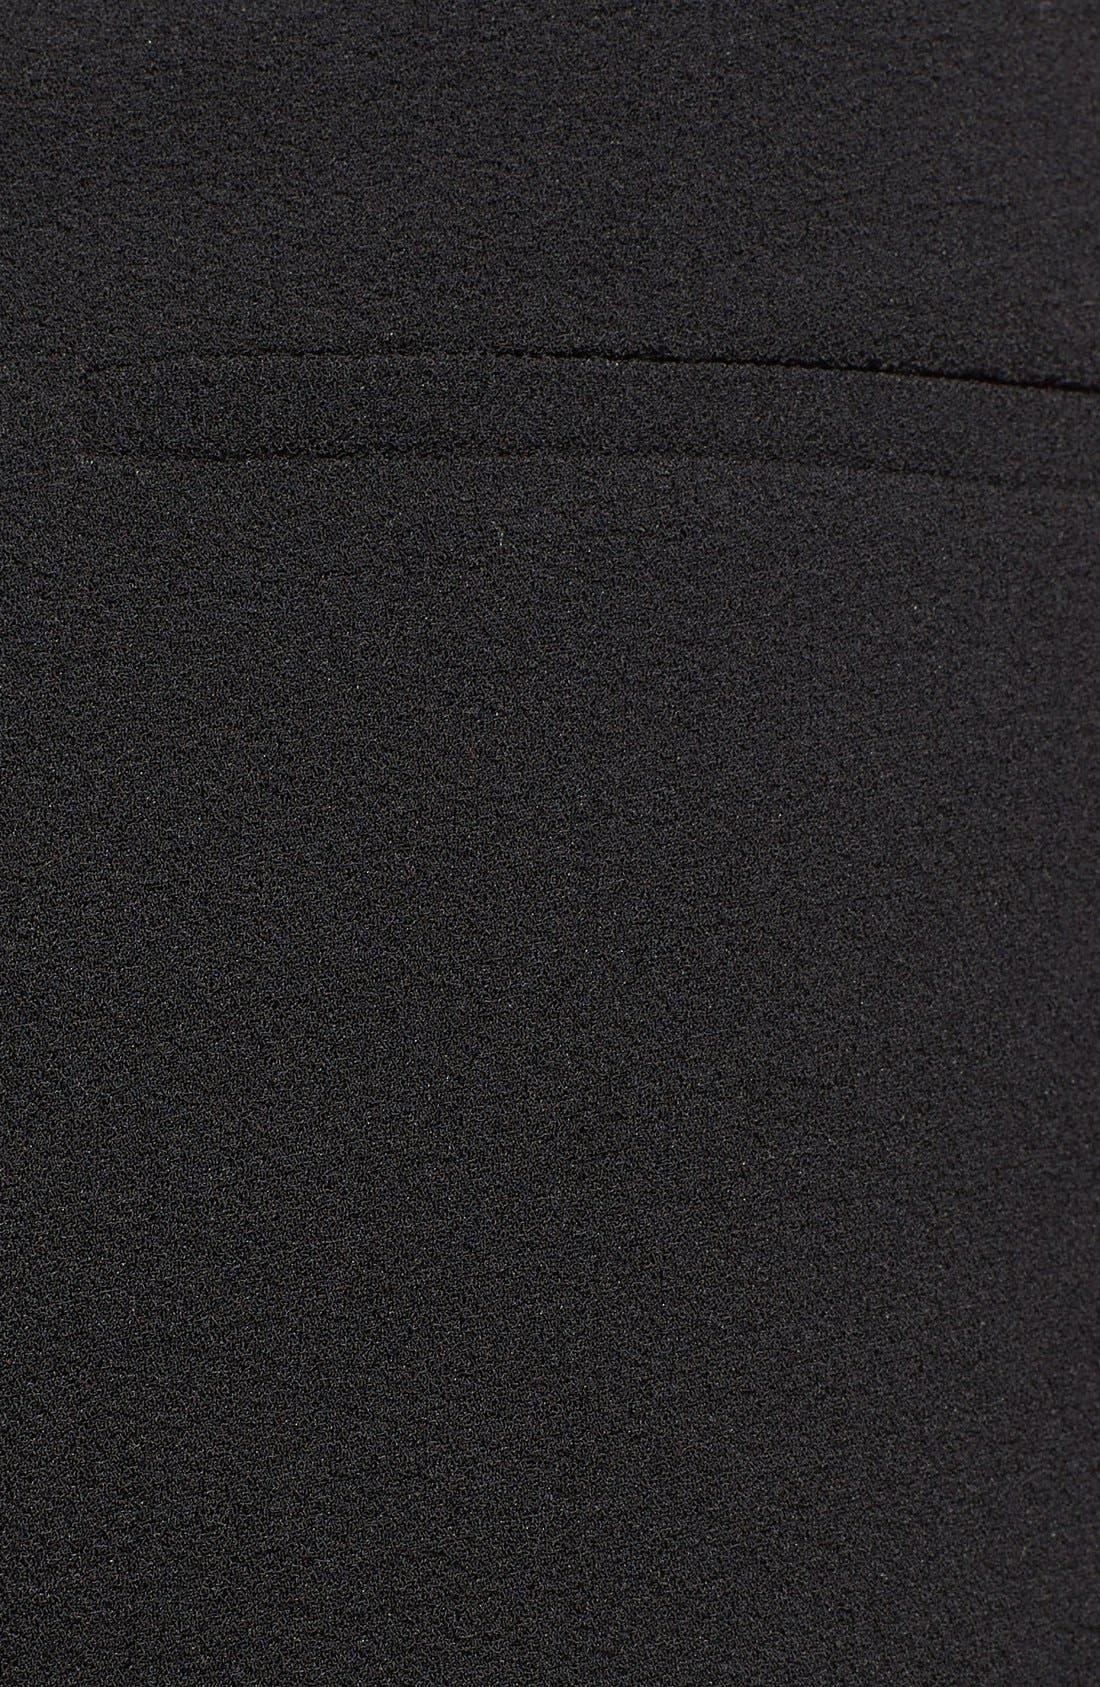 Alternate Image 3  - Vince Camuto Crop Pants